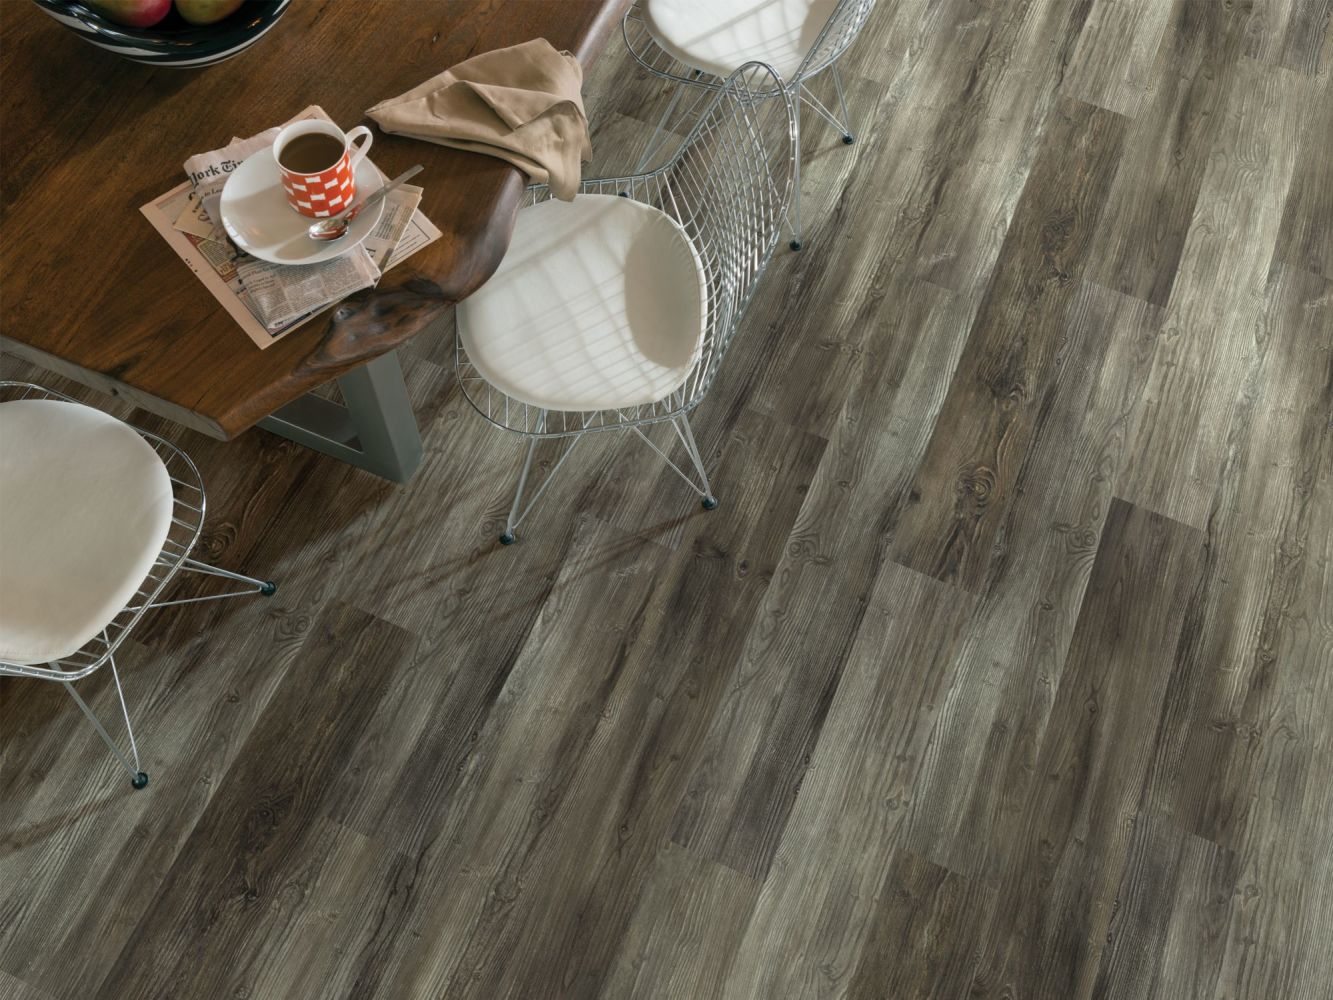 Shaw Floors Reality Homes Tipsoo Lake Harbour Bay 05030_105RH